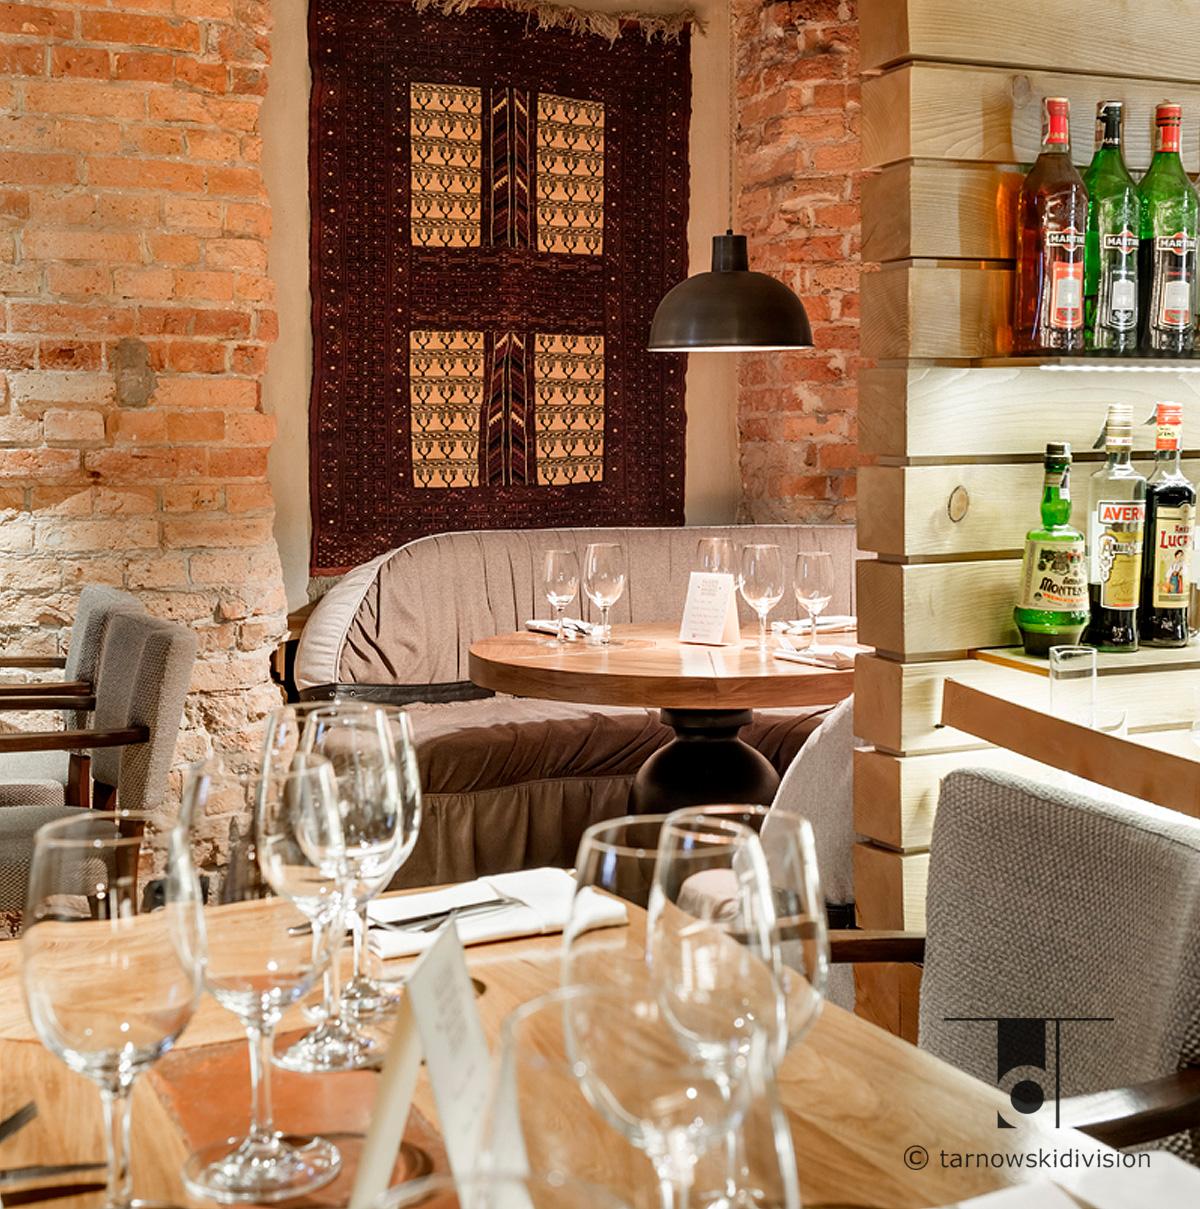 restauracja włoska Chianti projekt wnętrz restauracji italian restaurant interior design_tarnowskidivision